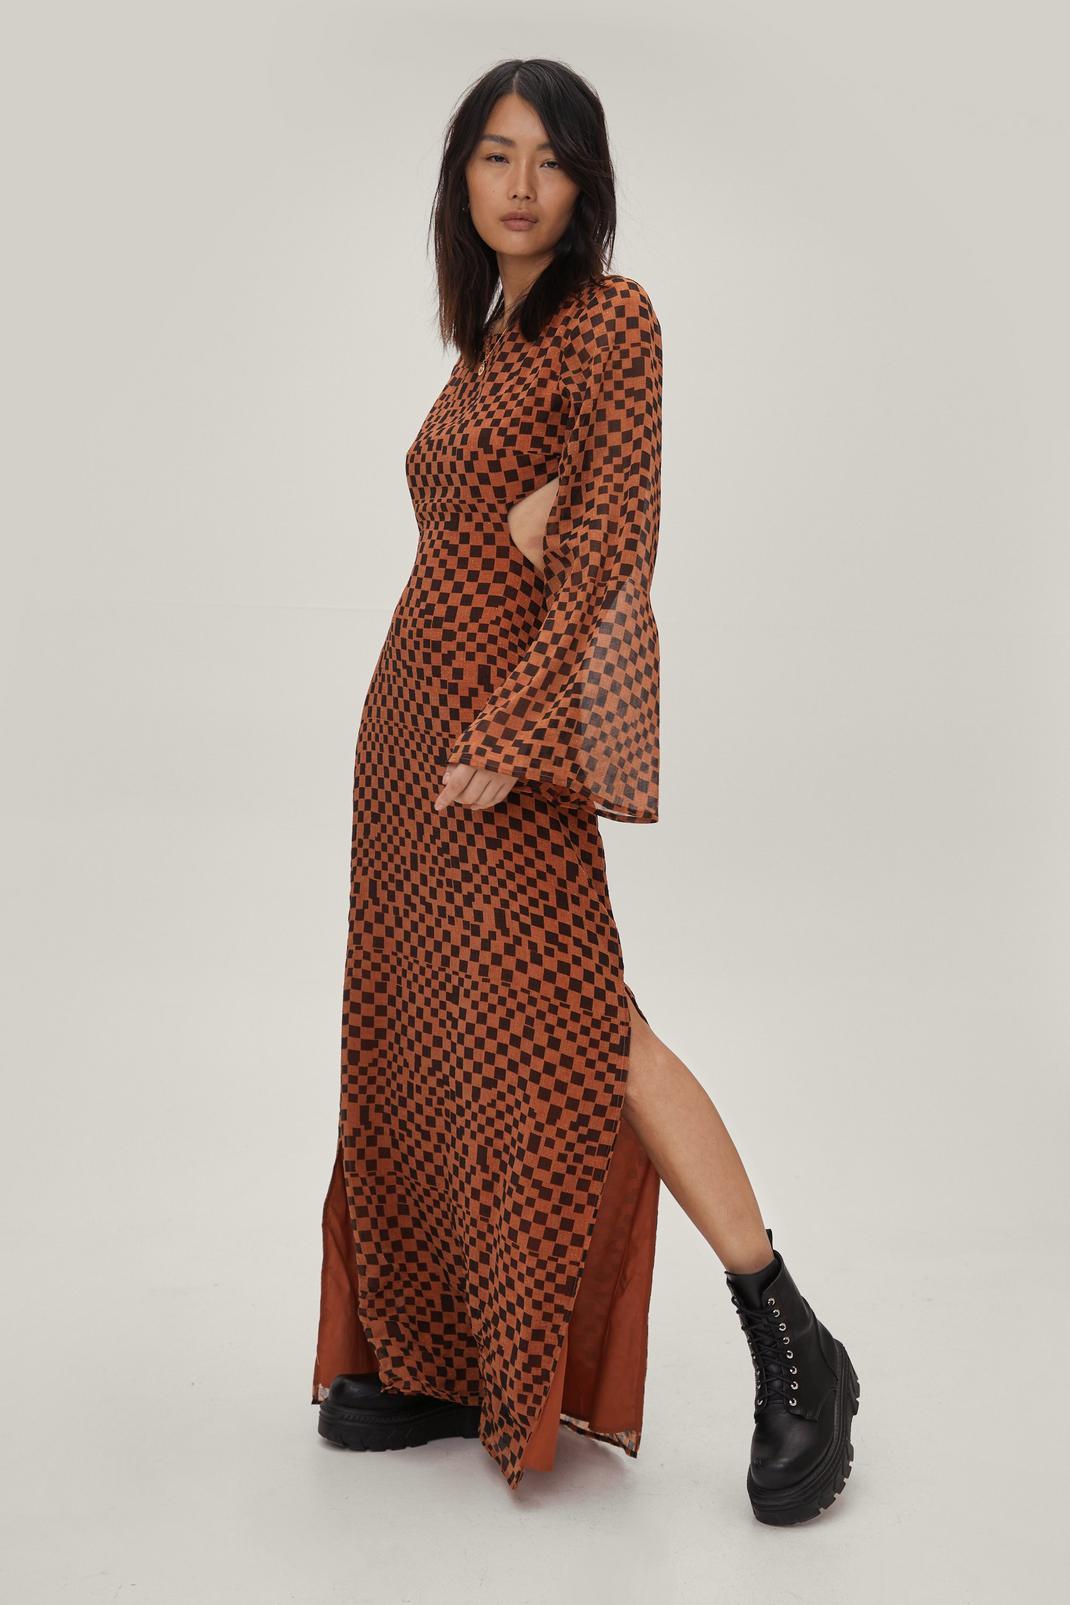 Checkerboard Backless Maxi Dress